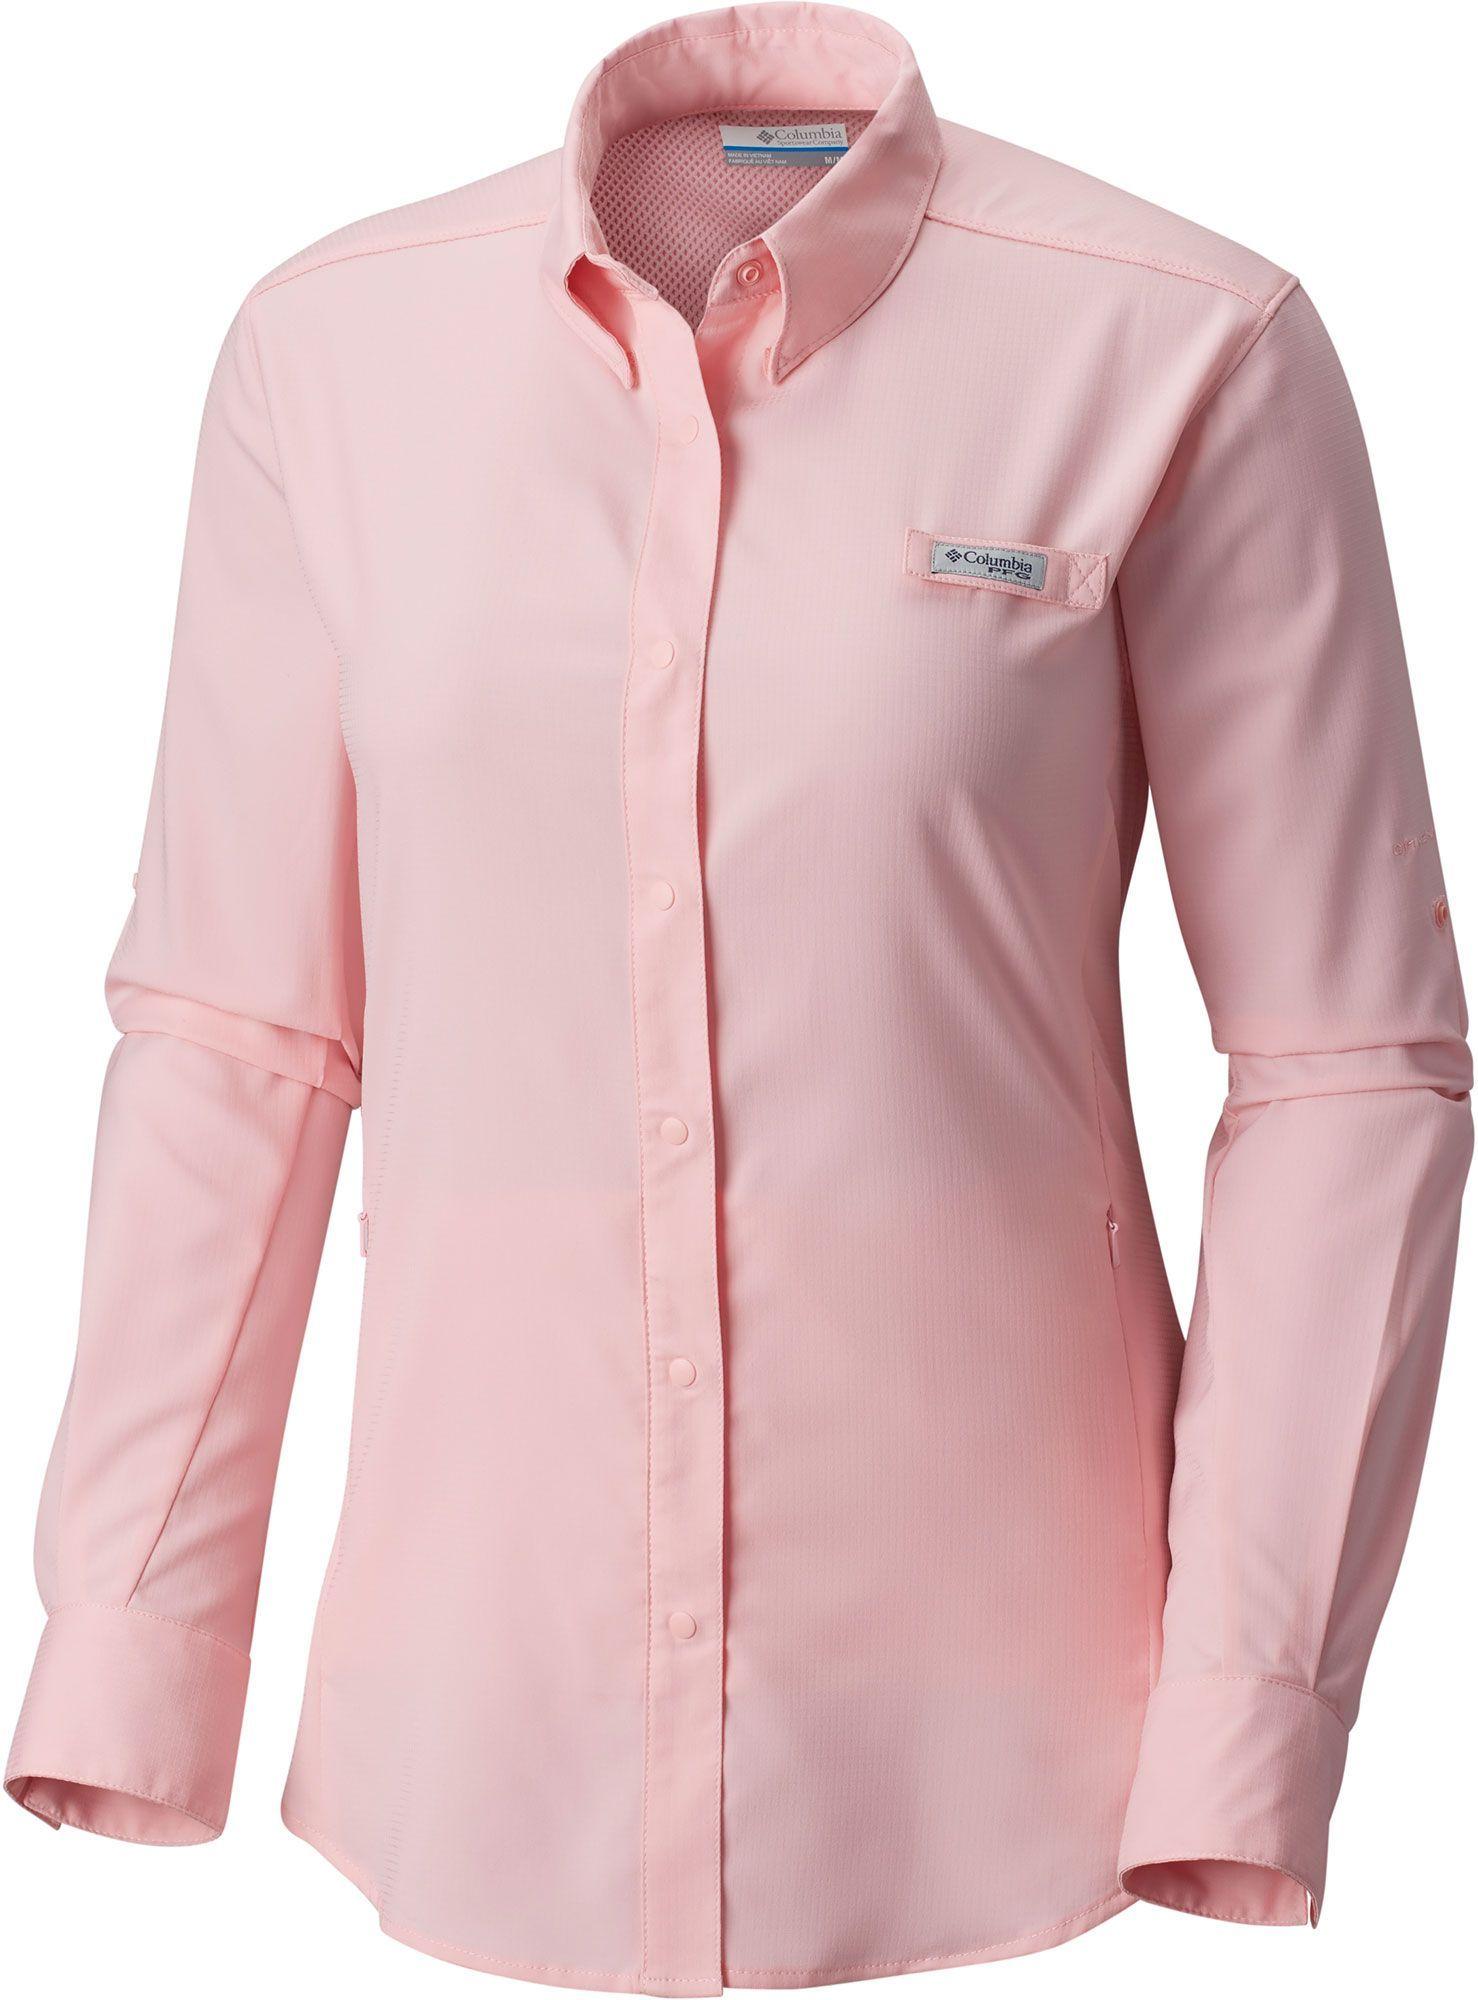 869b80c8cb3 Columbia Women's PFG Tamiami II Long Sleeve Shirt, Size: Small ...